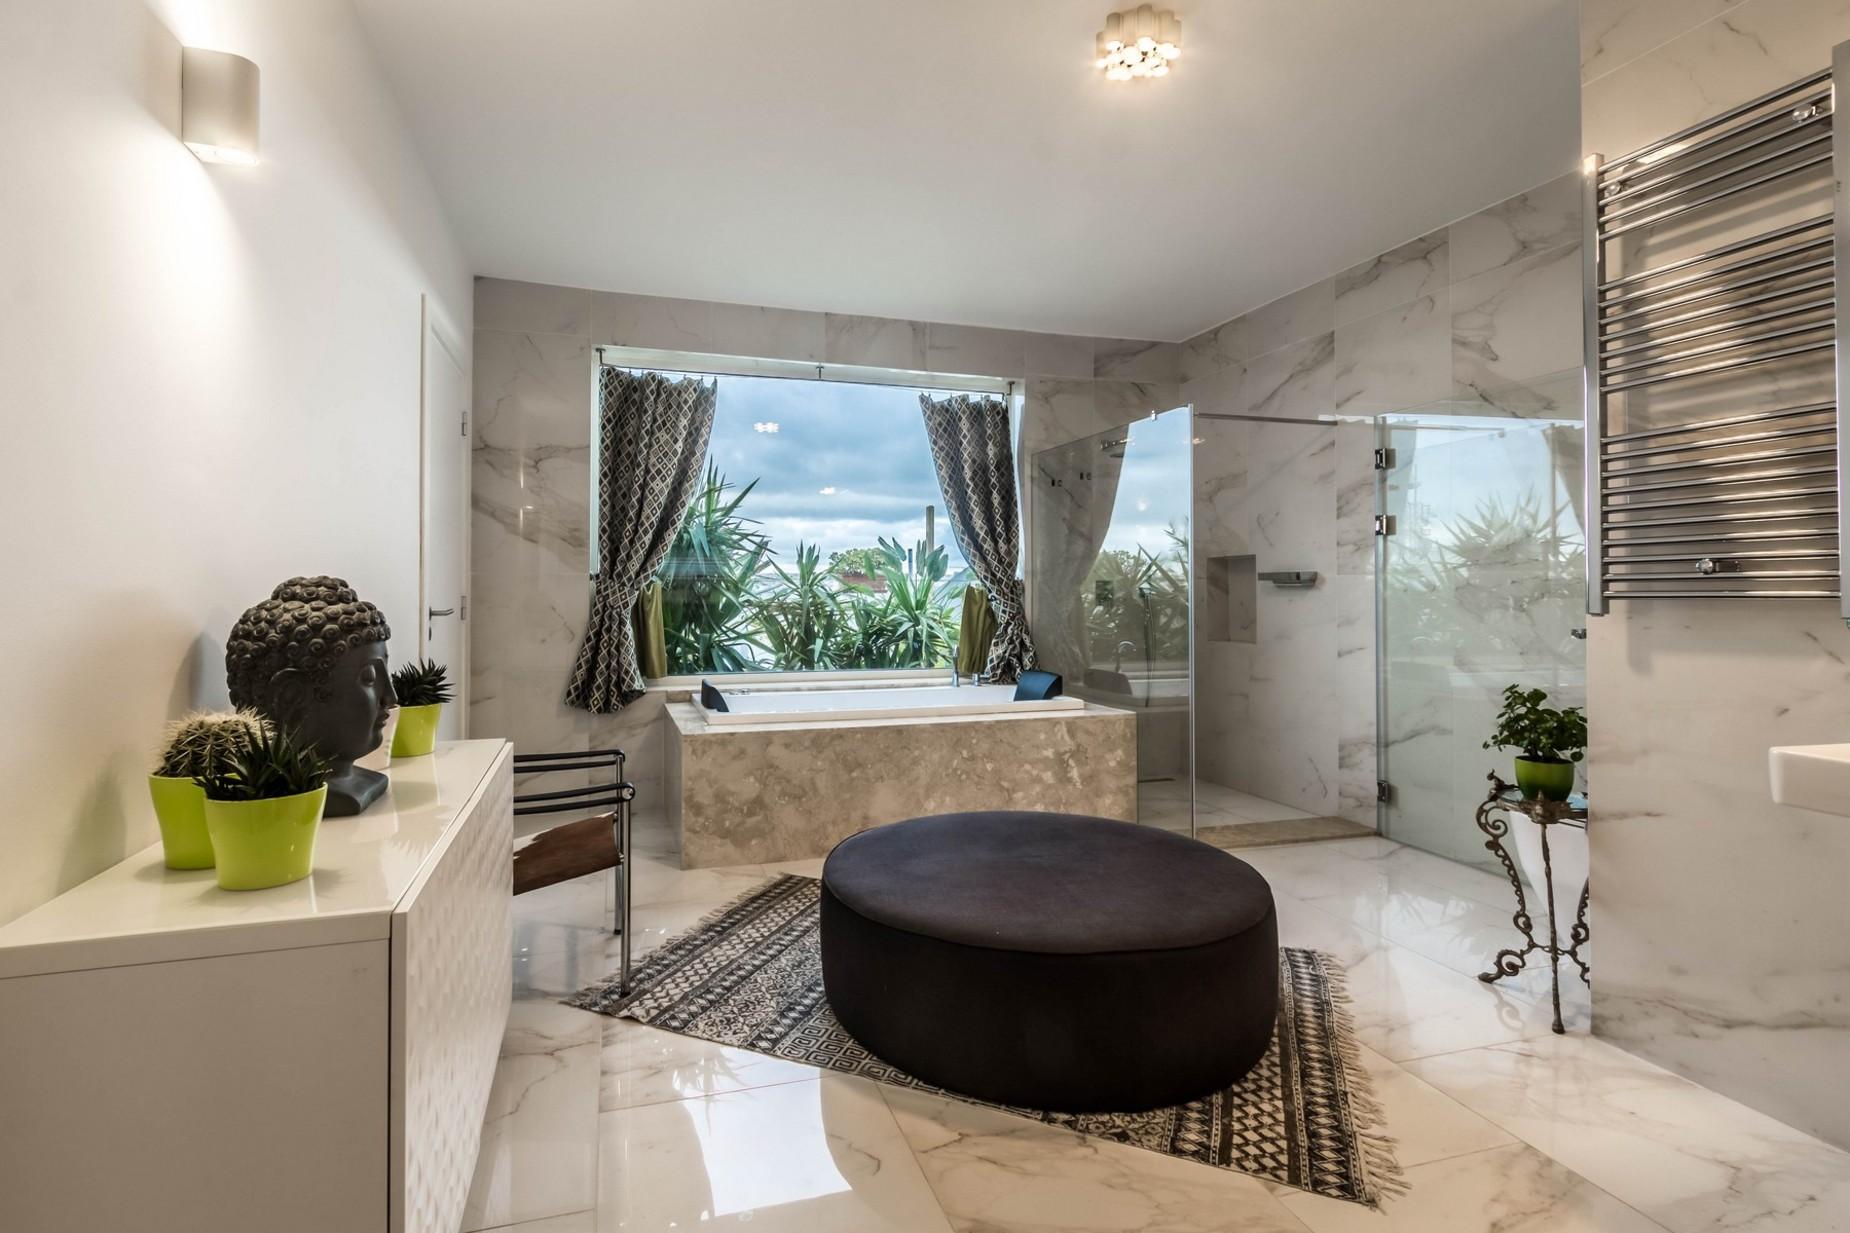 2 bed Penthouse For Sale in Pieta, Pieta - thumb 10